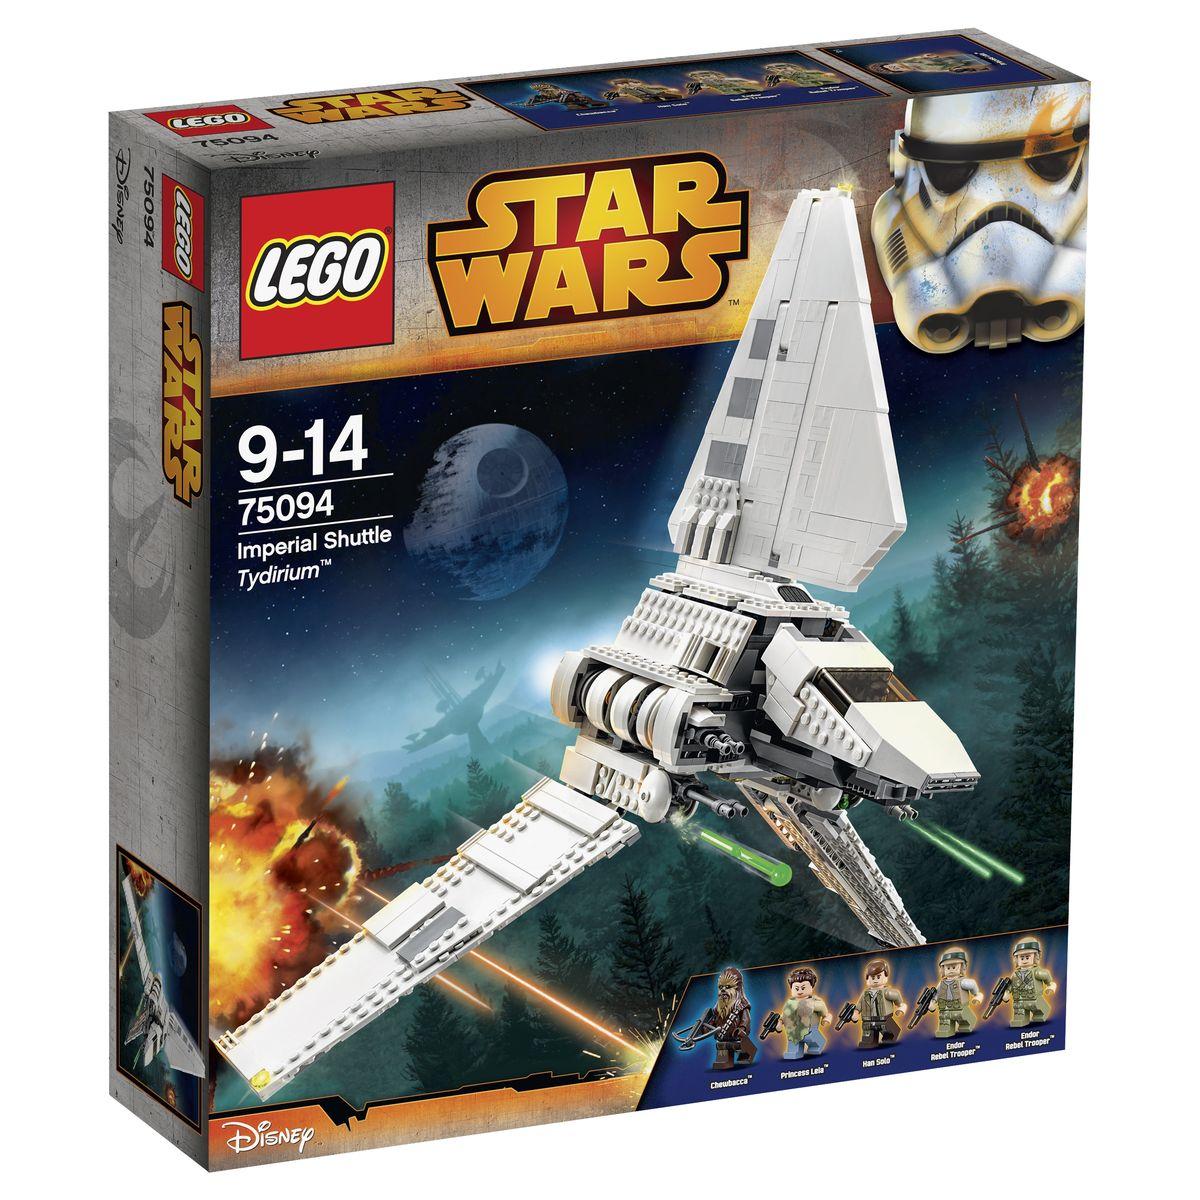 LEGO Star Wars Конструктор Имперский шаттл Тайдириум 75094 lego lego star wars 75094 лего звездные войны имперский шаттл тайдириум